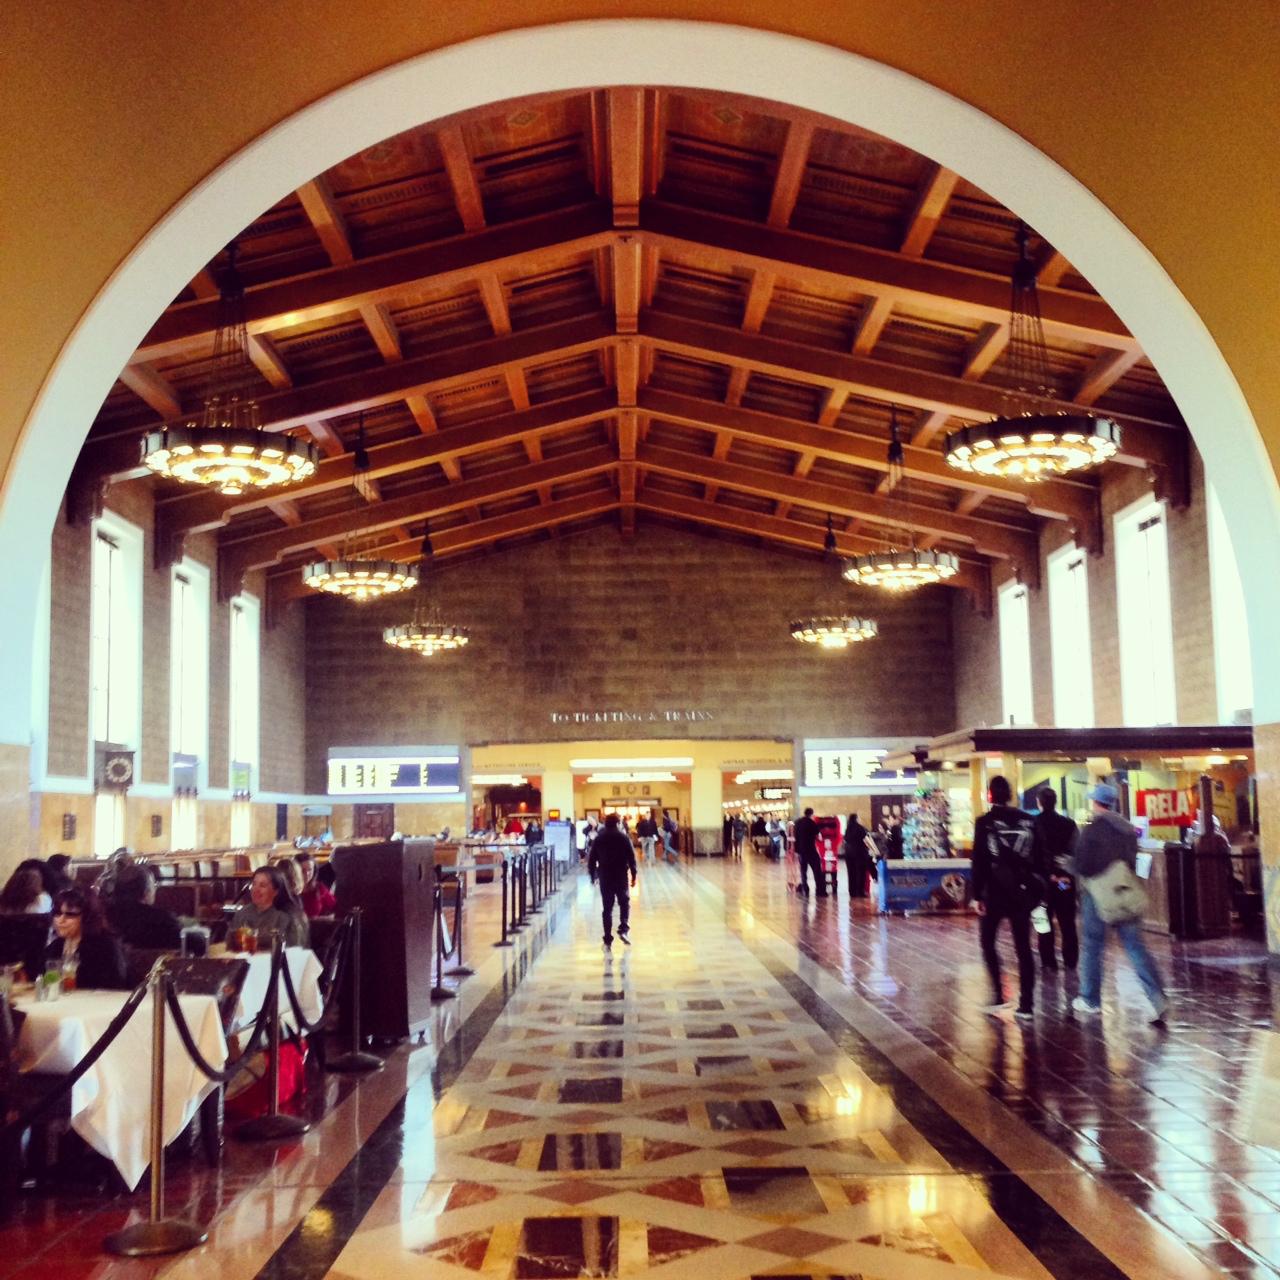 DTLA Union Station